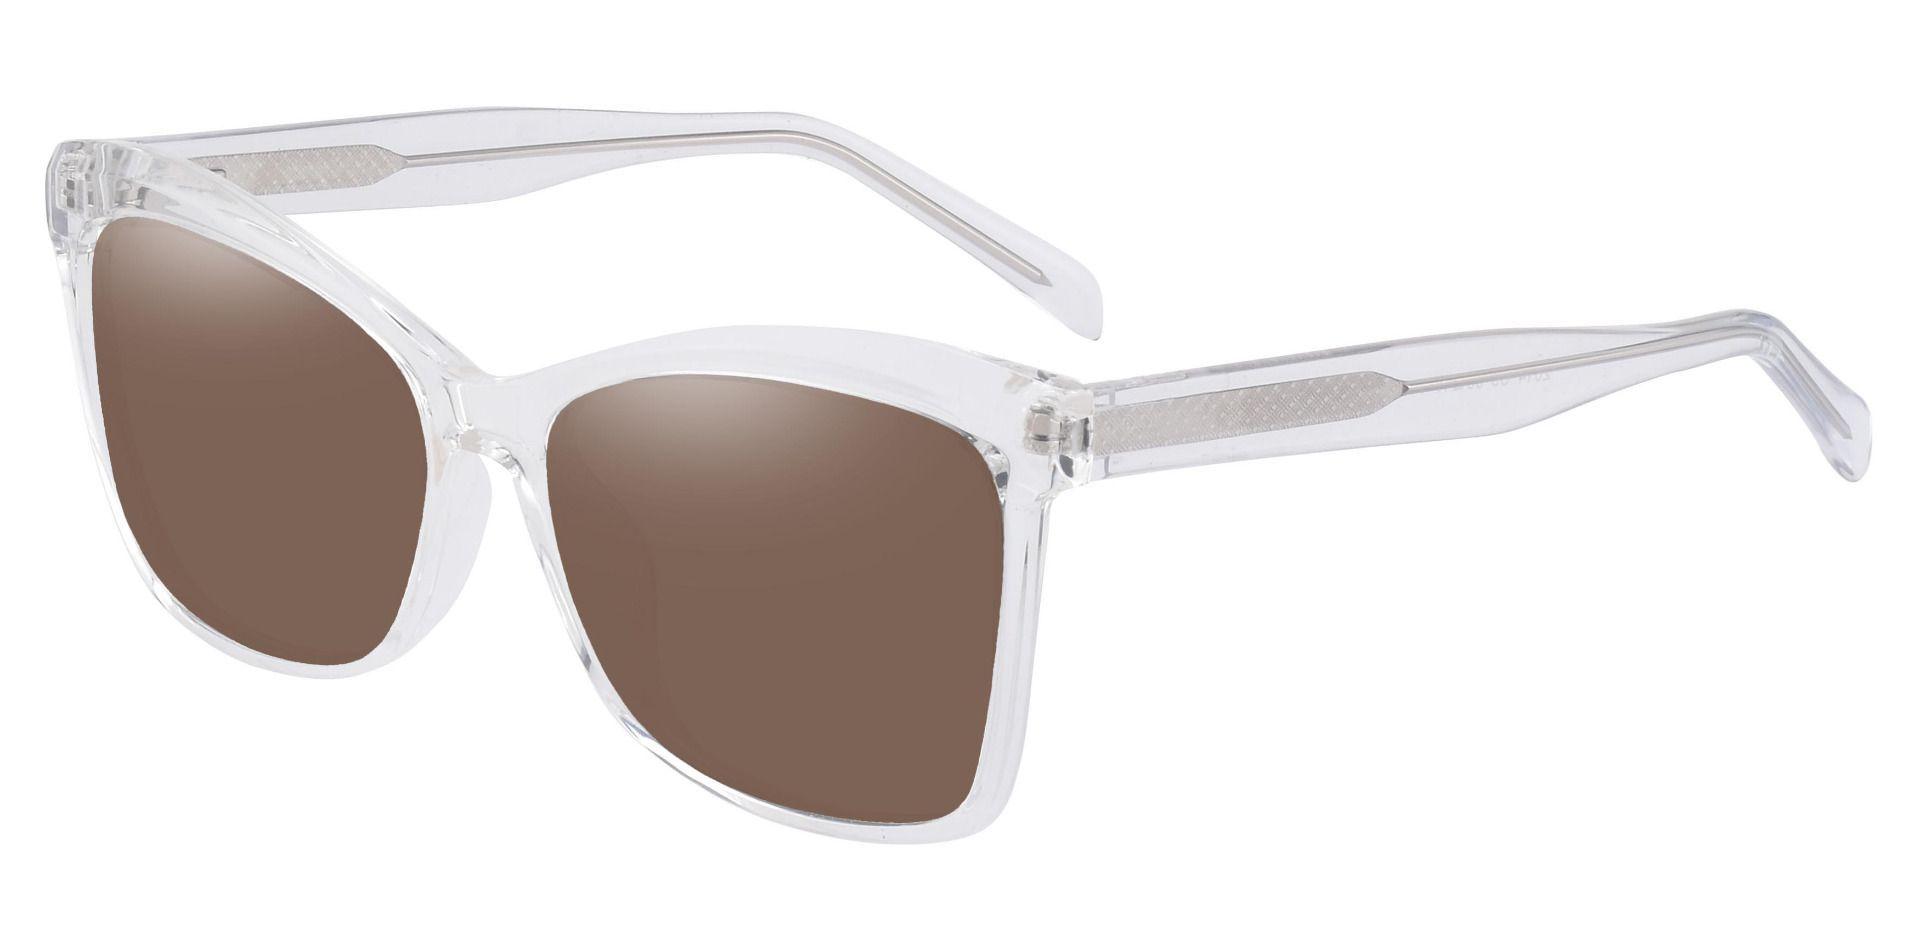 Lexi Cat Eye Progressive Sunglasses - Clear Frame With Brown Lenses